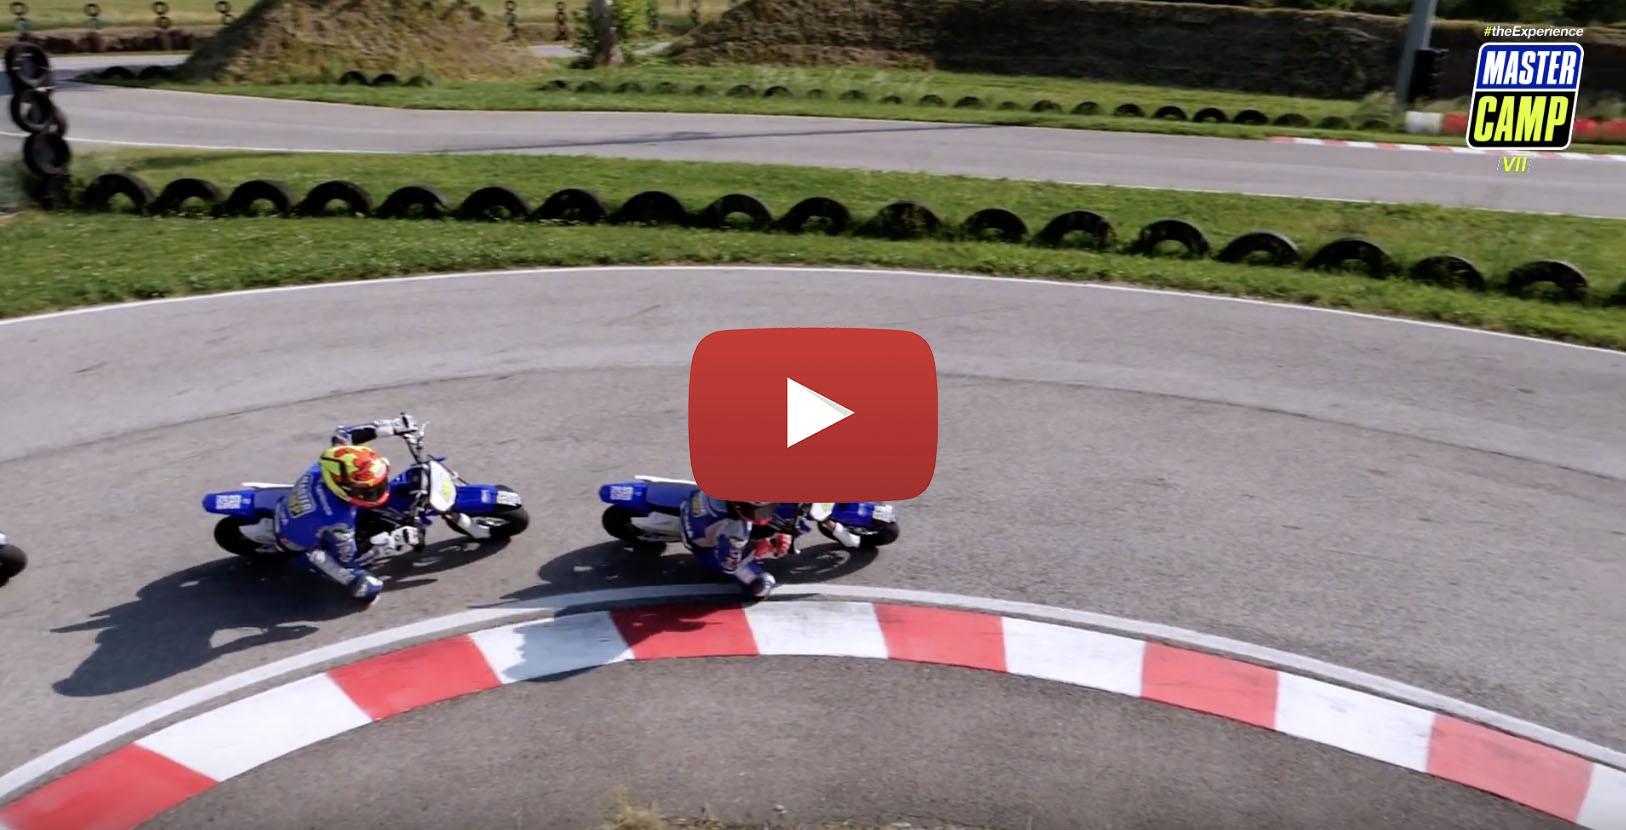 Yamaha VR46 Master Camp Review Video